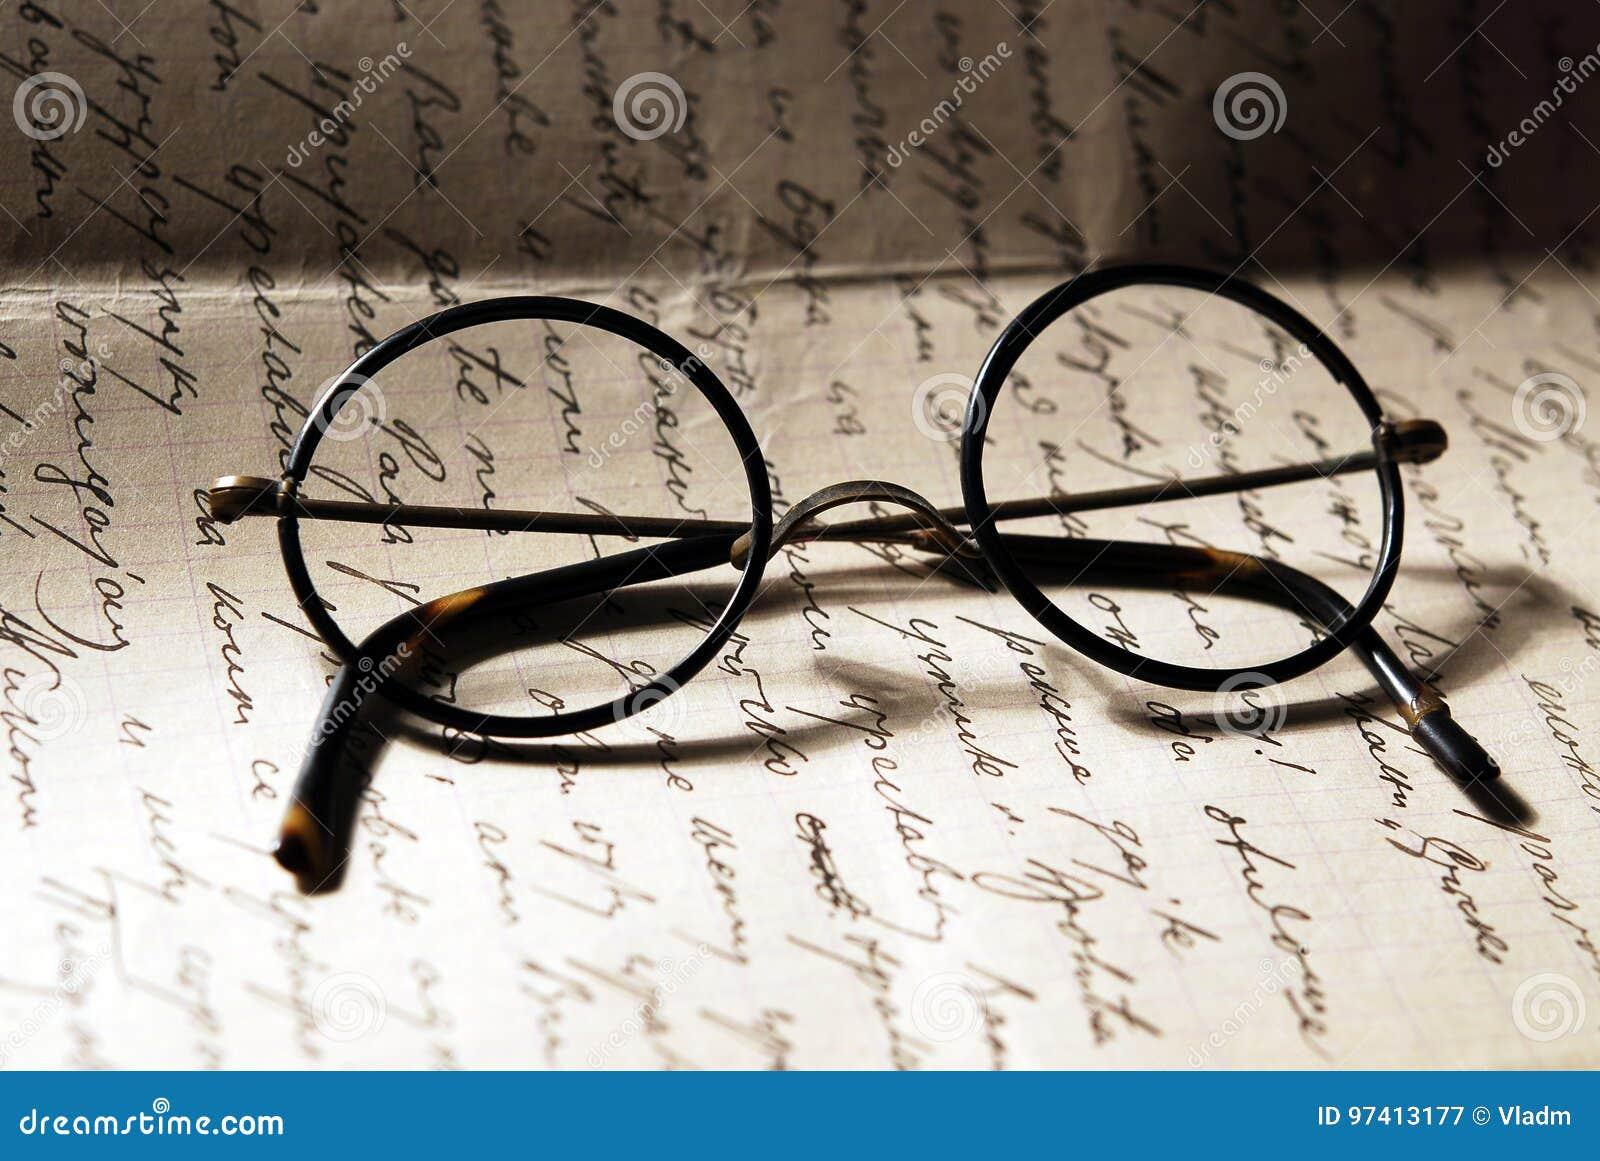 Старые стекла на письме